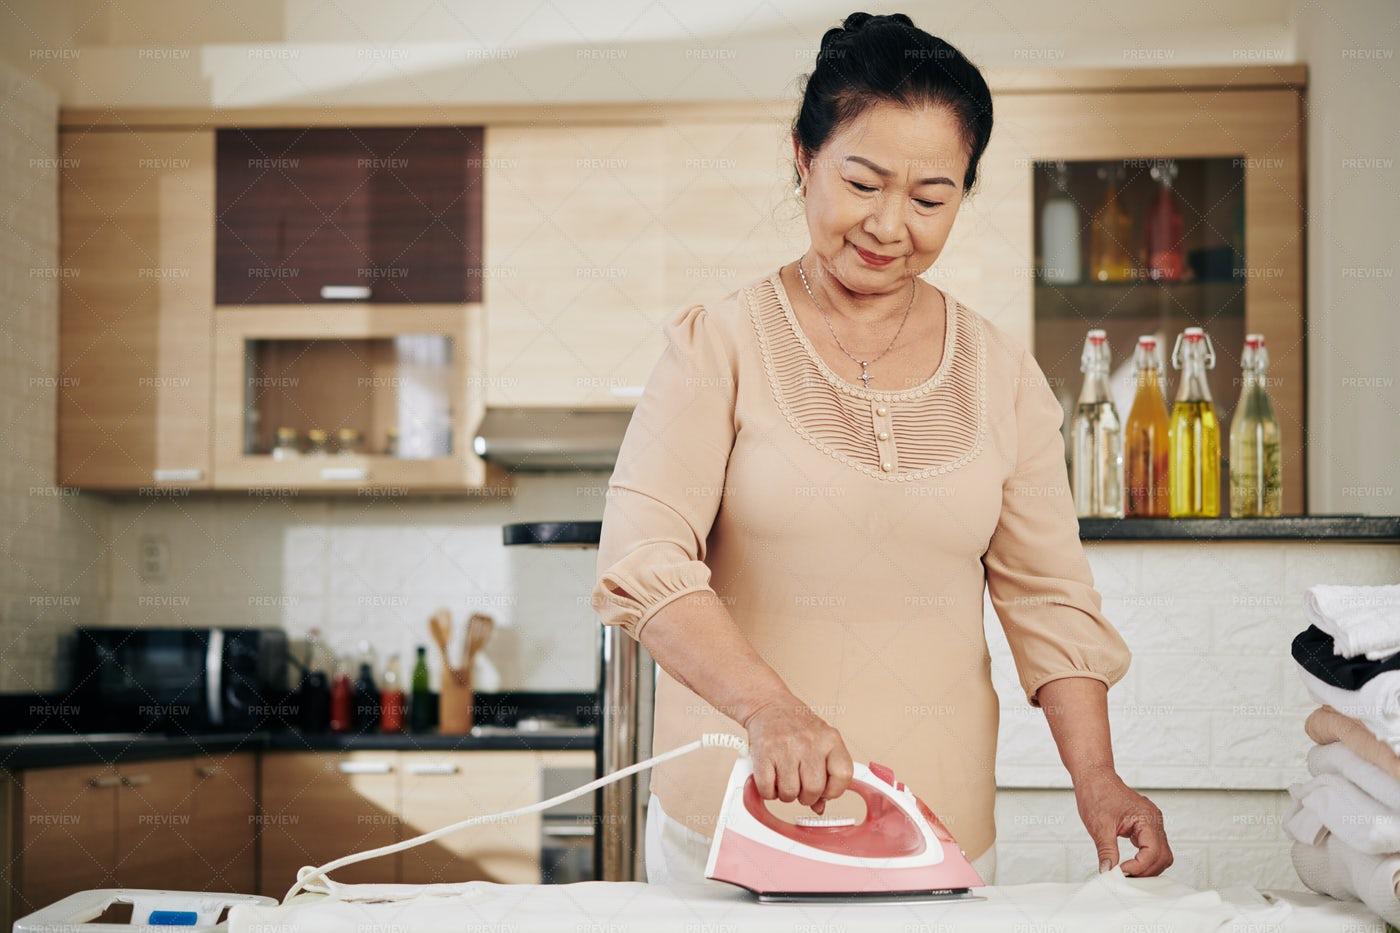 Senior Woman Ironing Clothes: Stock Photos